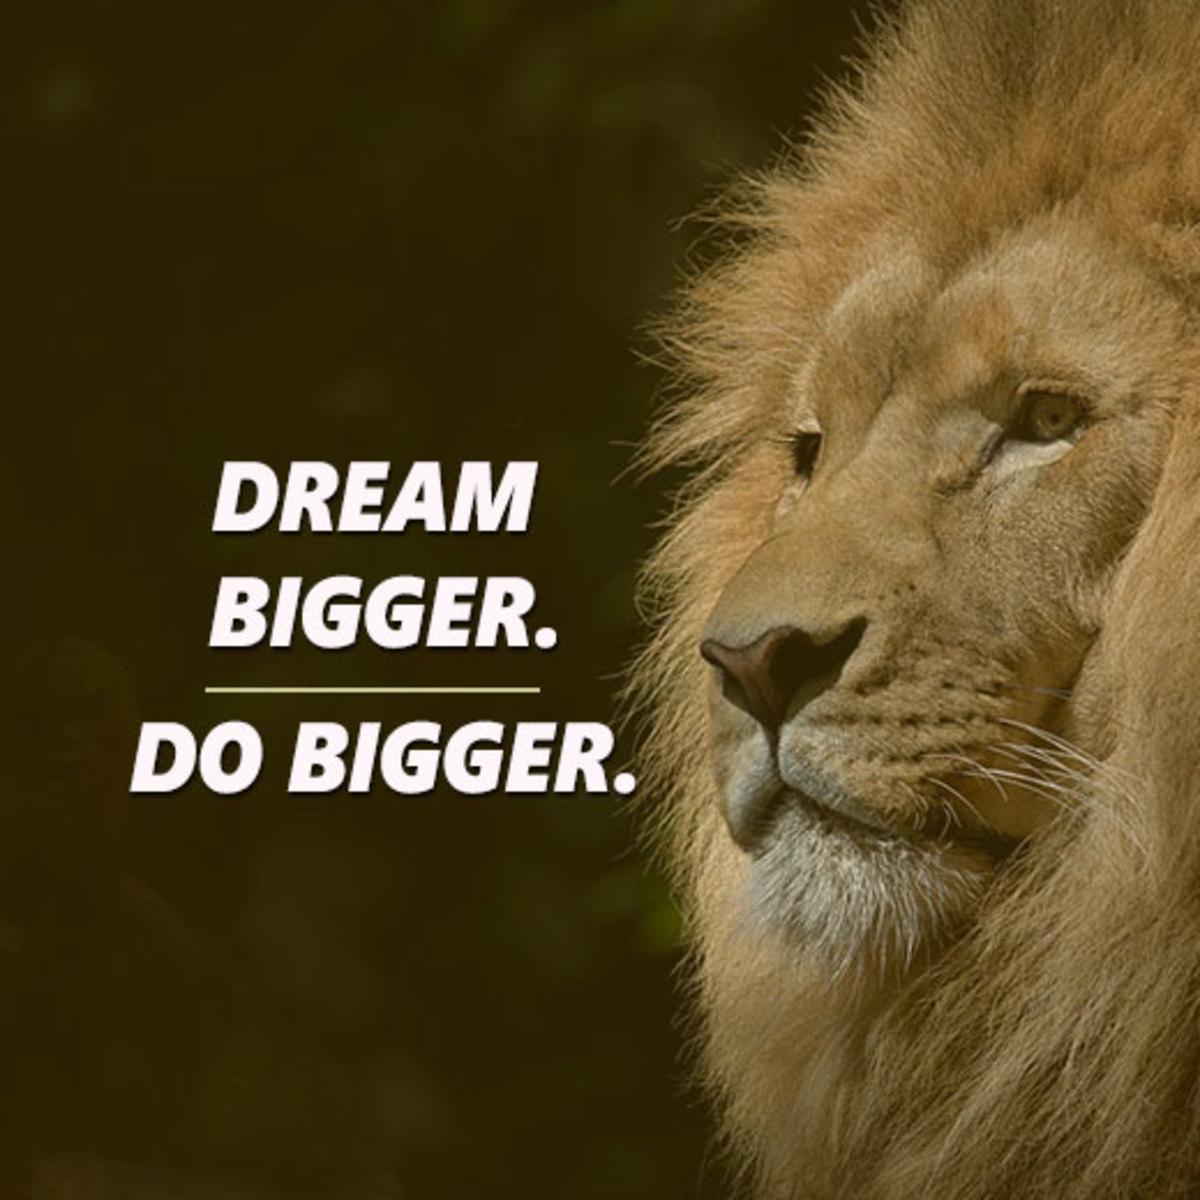 When you dream bigger, you do bigger.